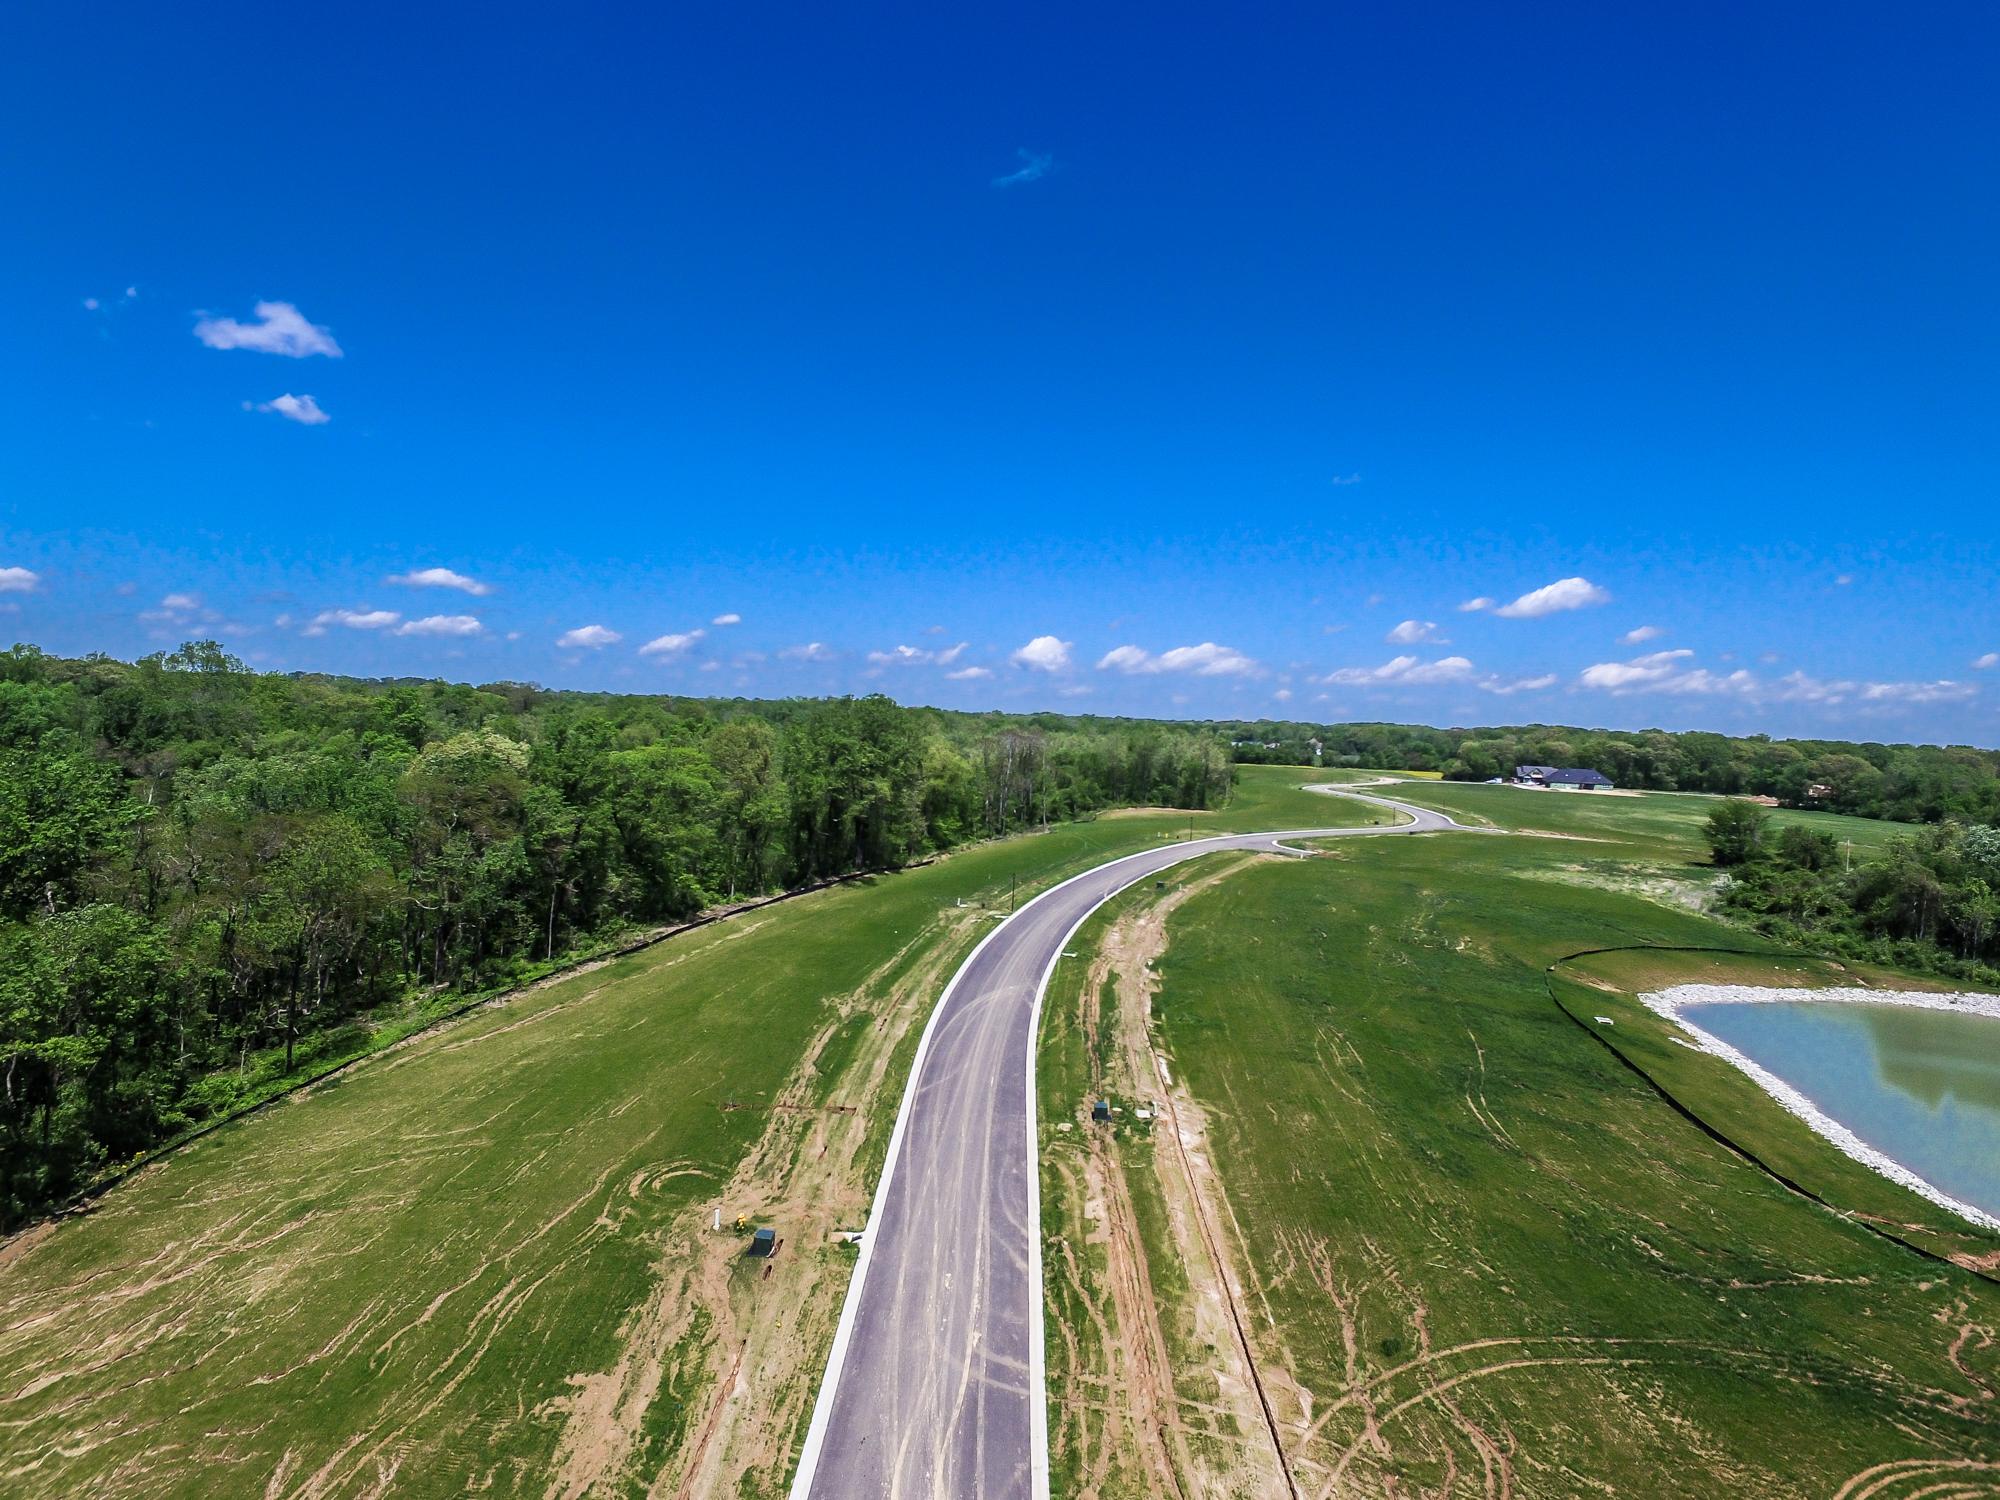 Bethel_Ridge_Farms_O'Fallon_Illinois_Aerials_Progress_5.3.17-20.jpg